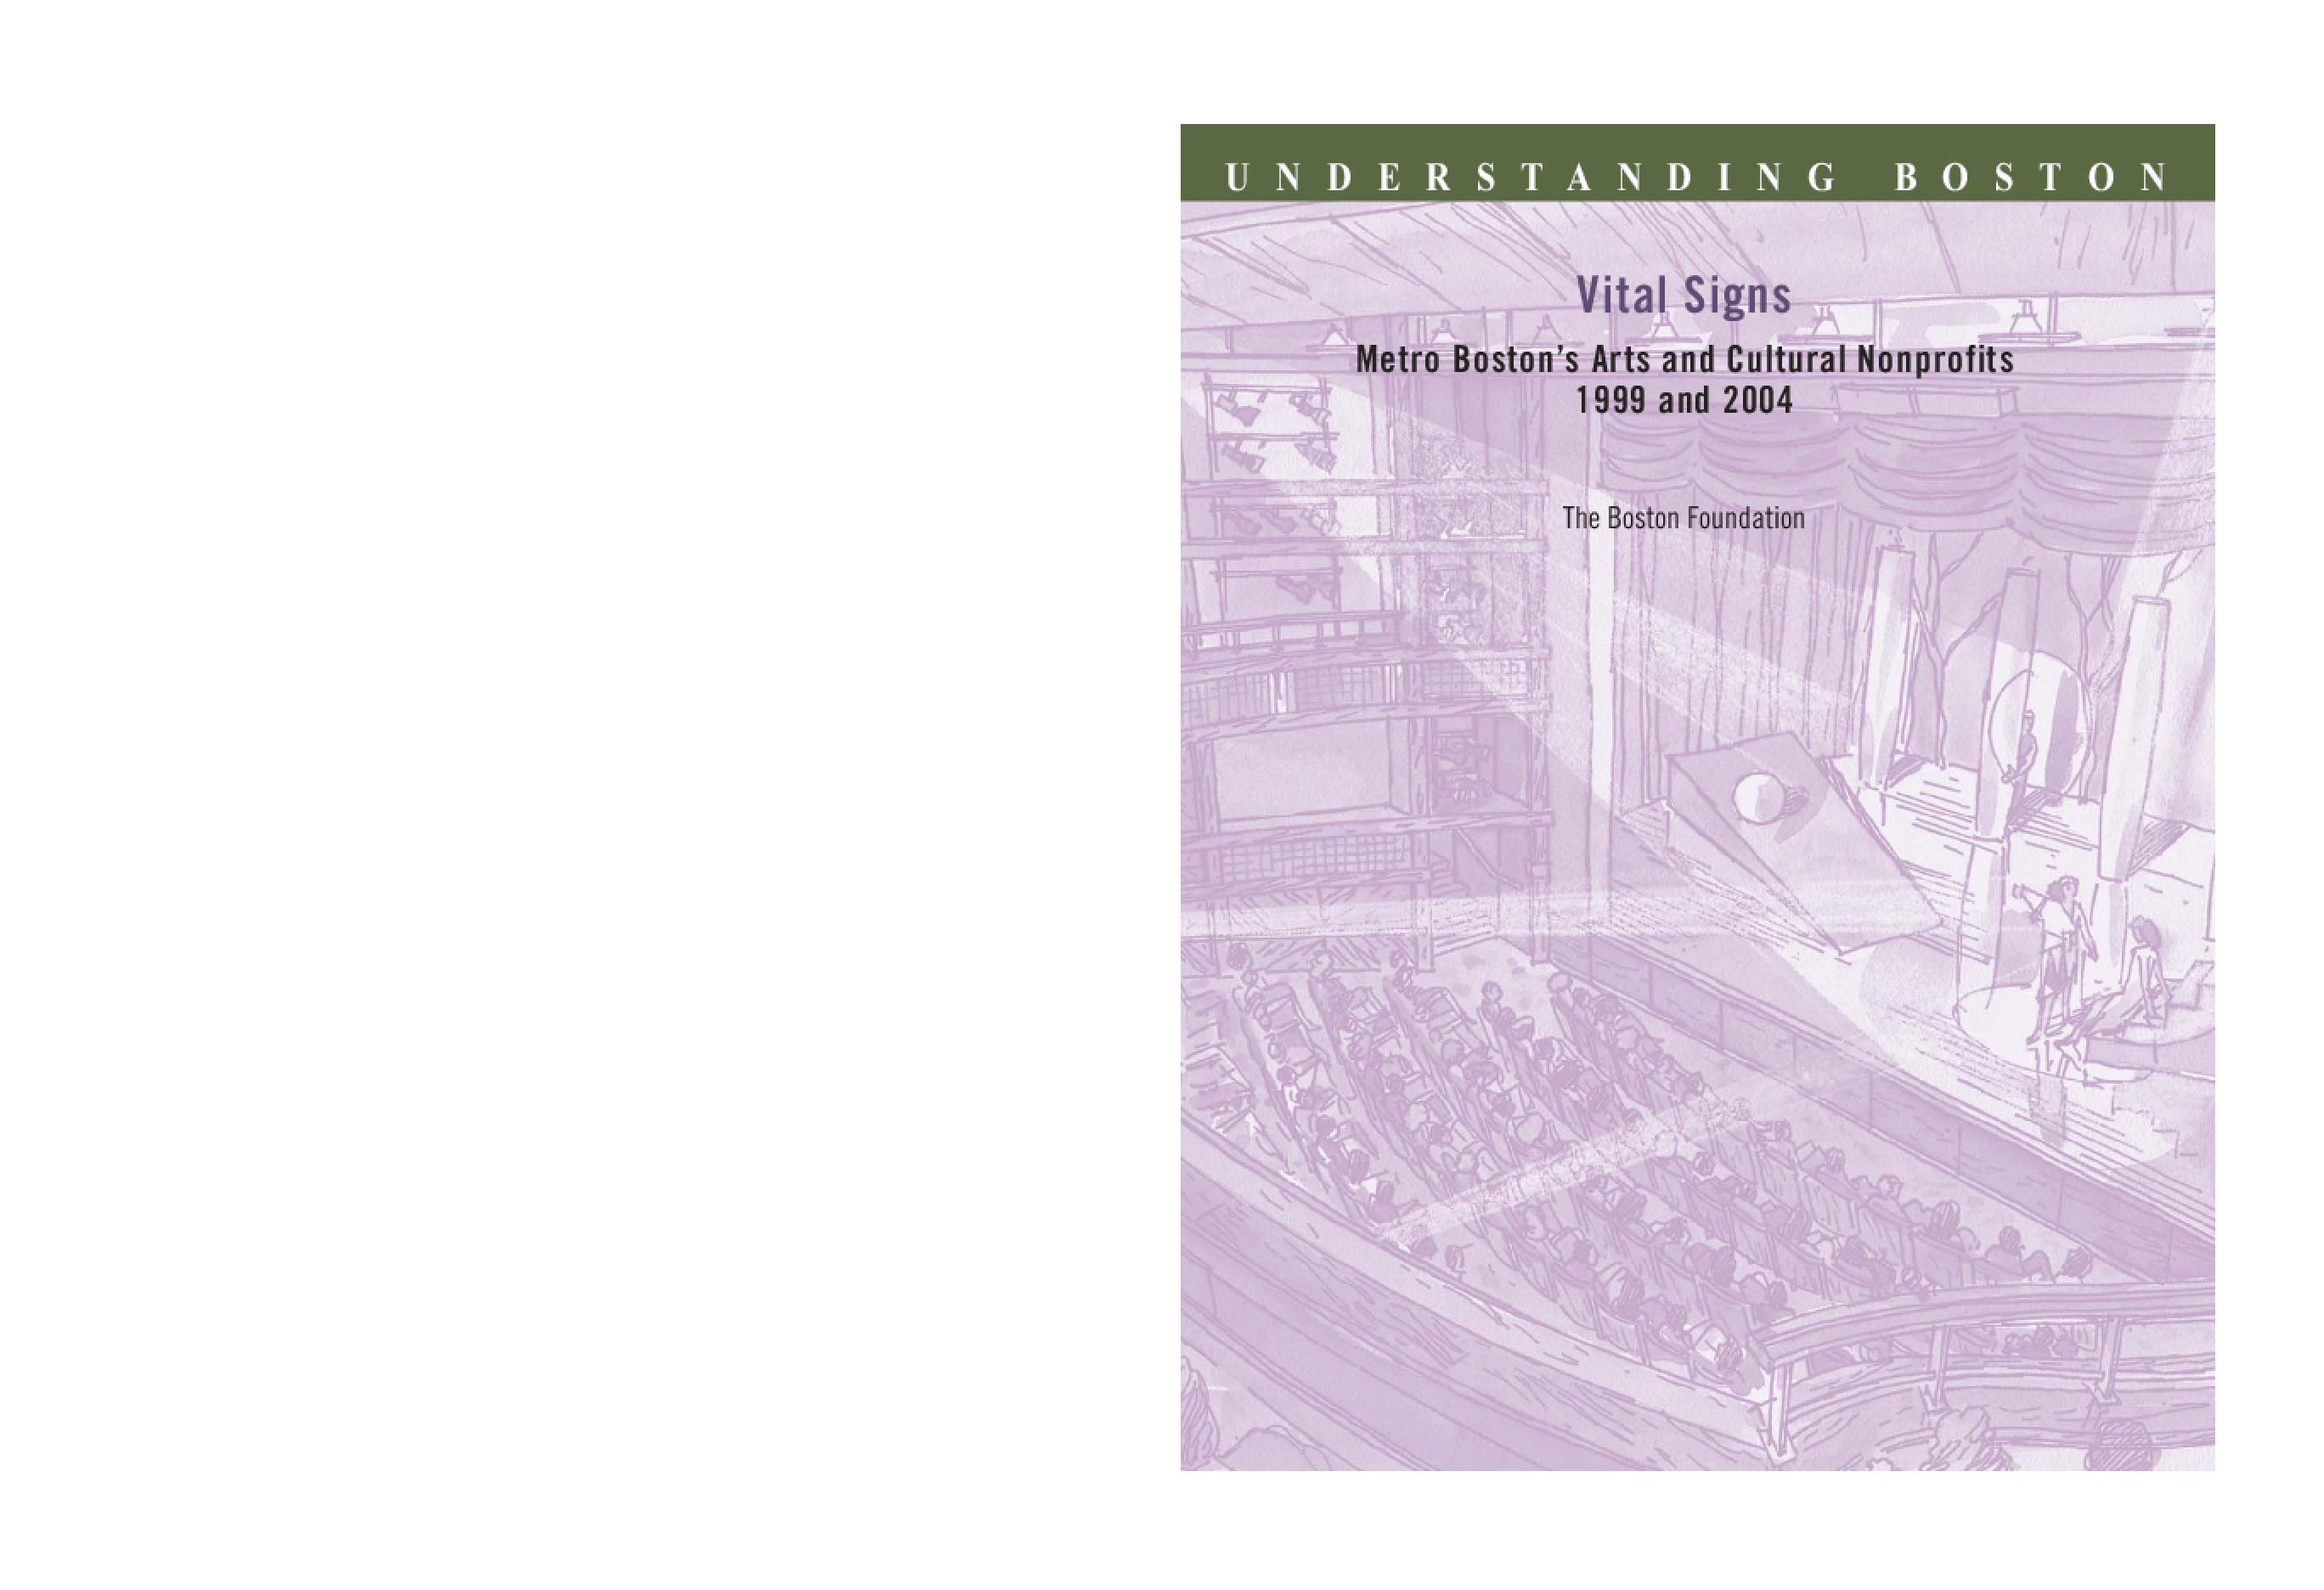 Vital Signs: Metro Boston's Arts and Cultural Nonprofits 1999 and 2004